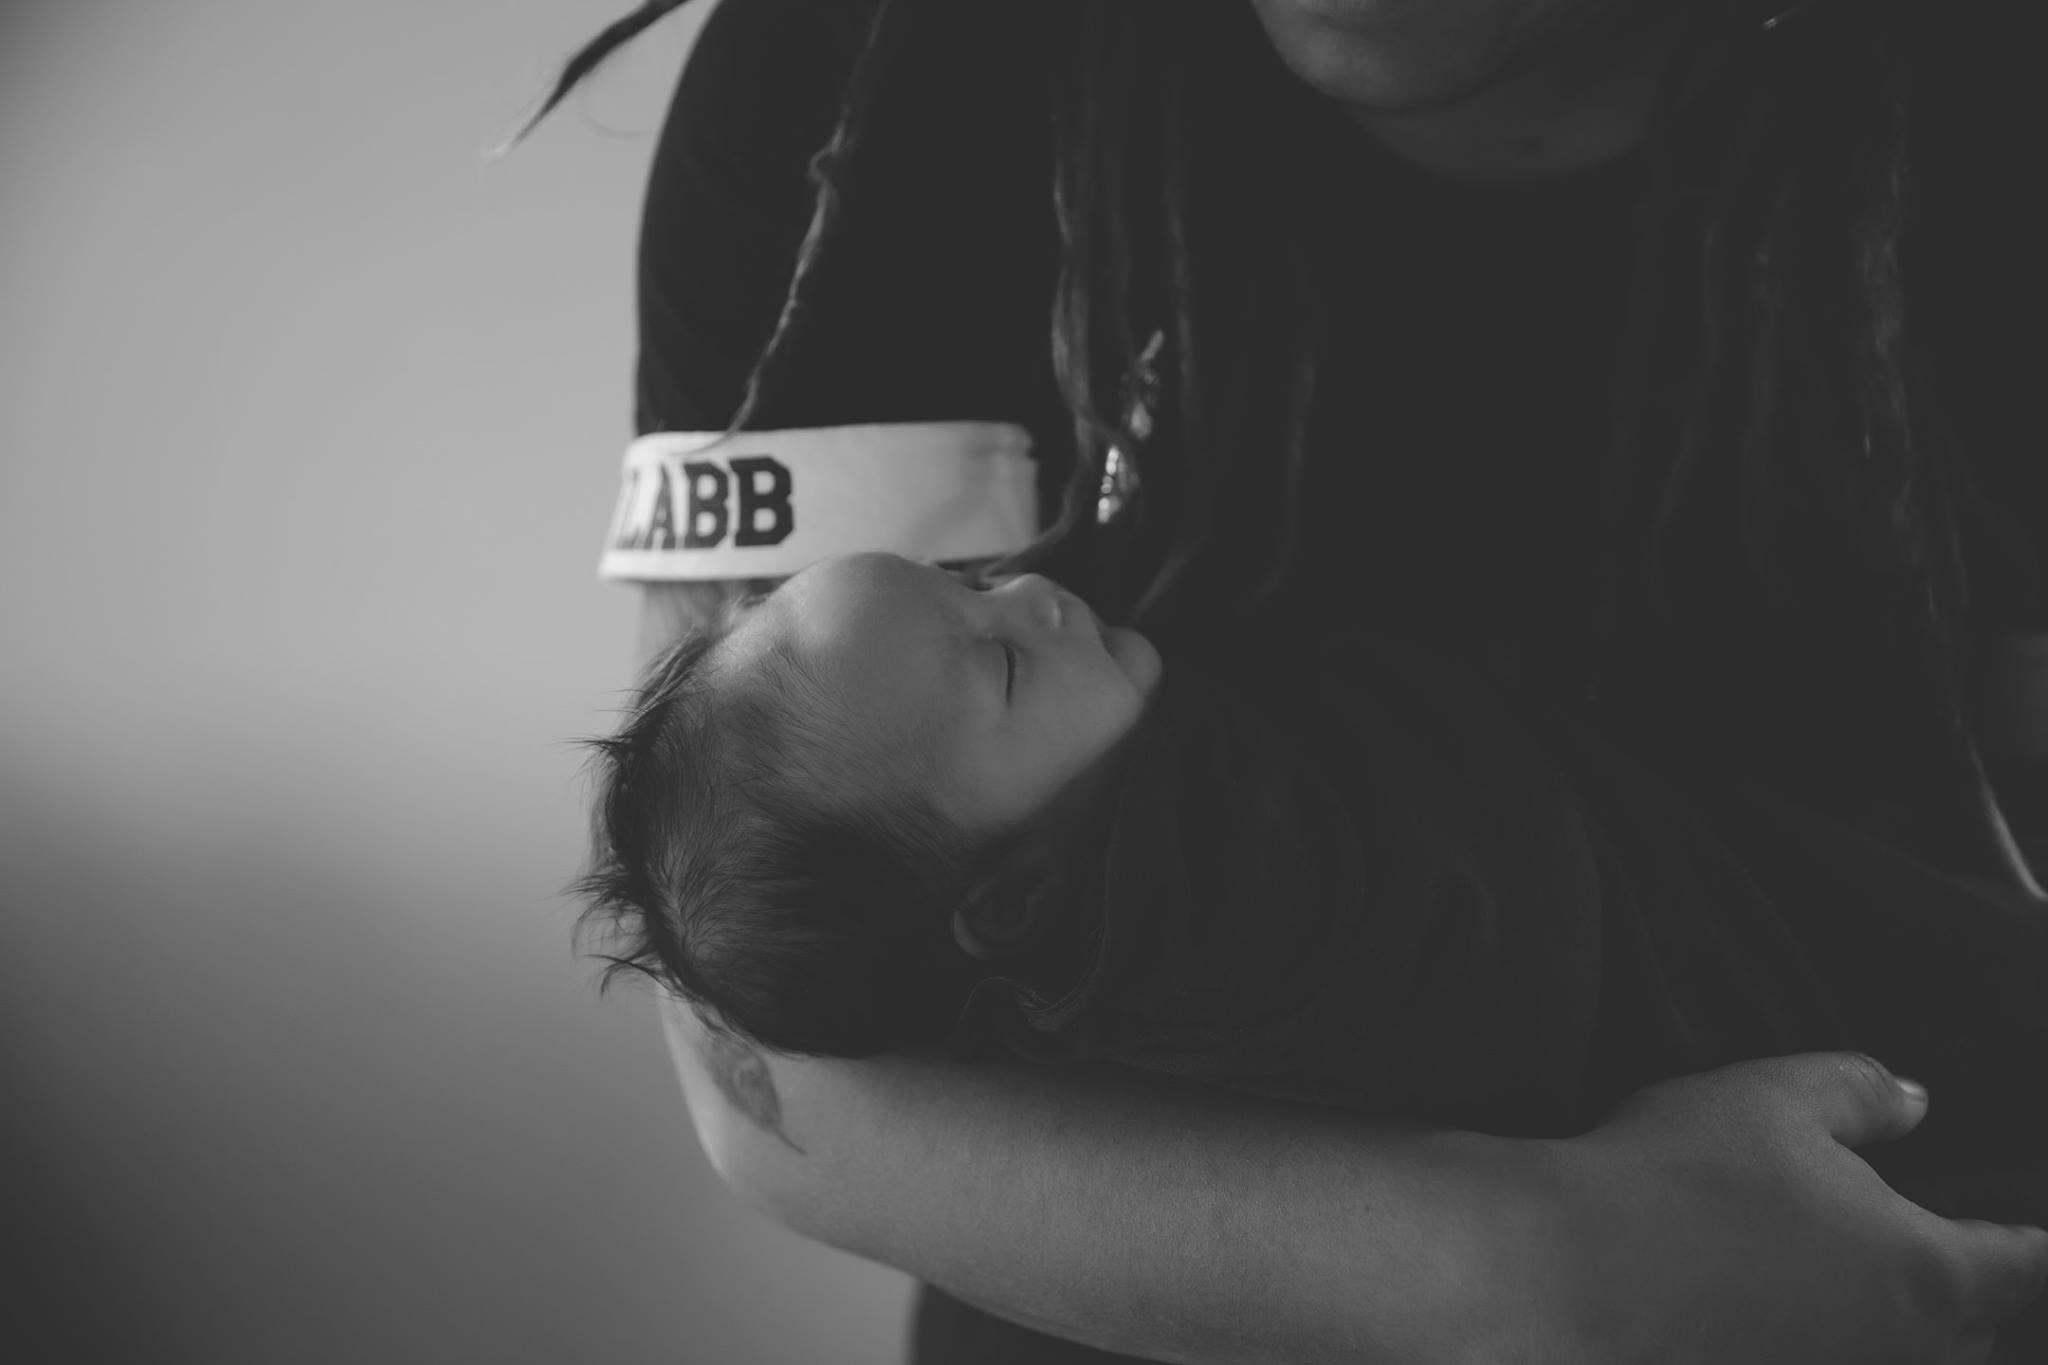 baby6.jpg